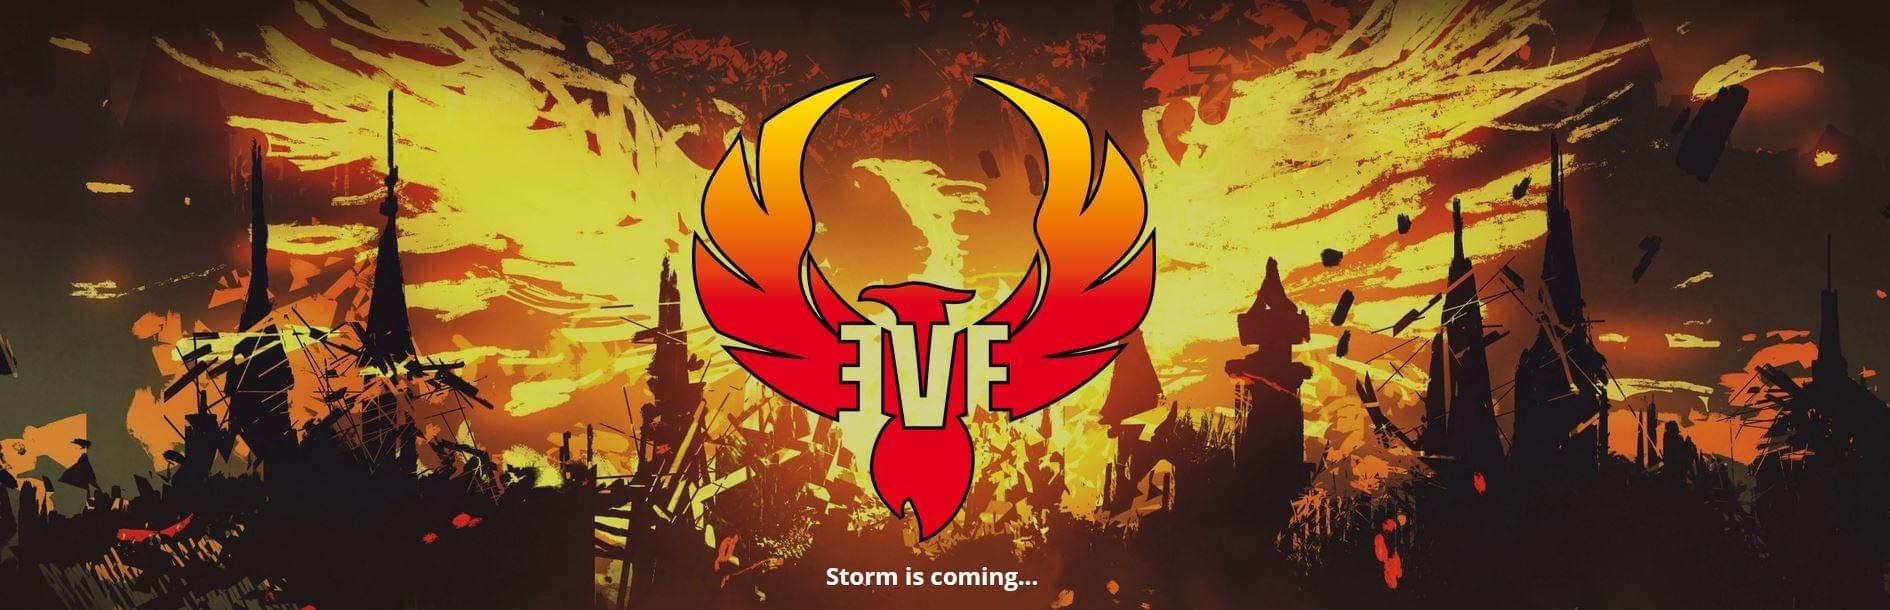 EVE-STORM IS COMING – ROCKOPERA VAN LIMBURGSE BODEM